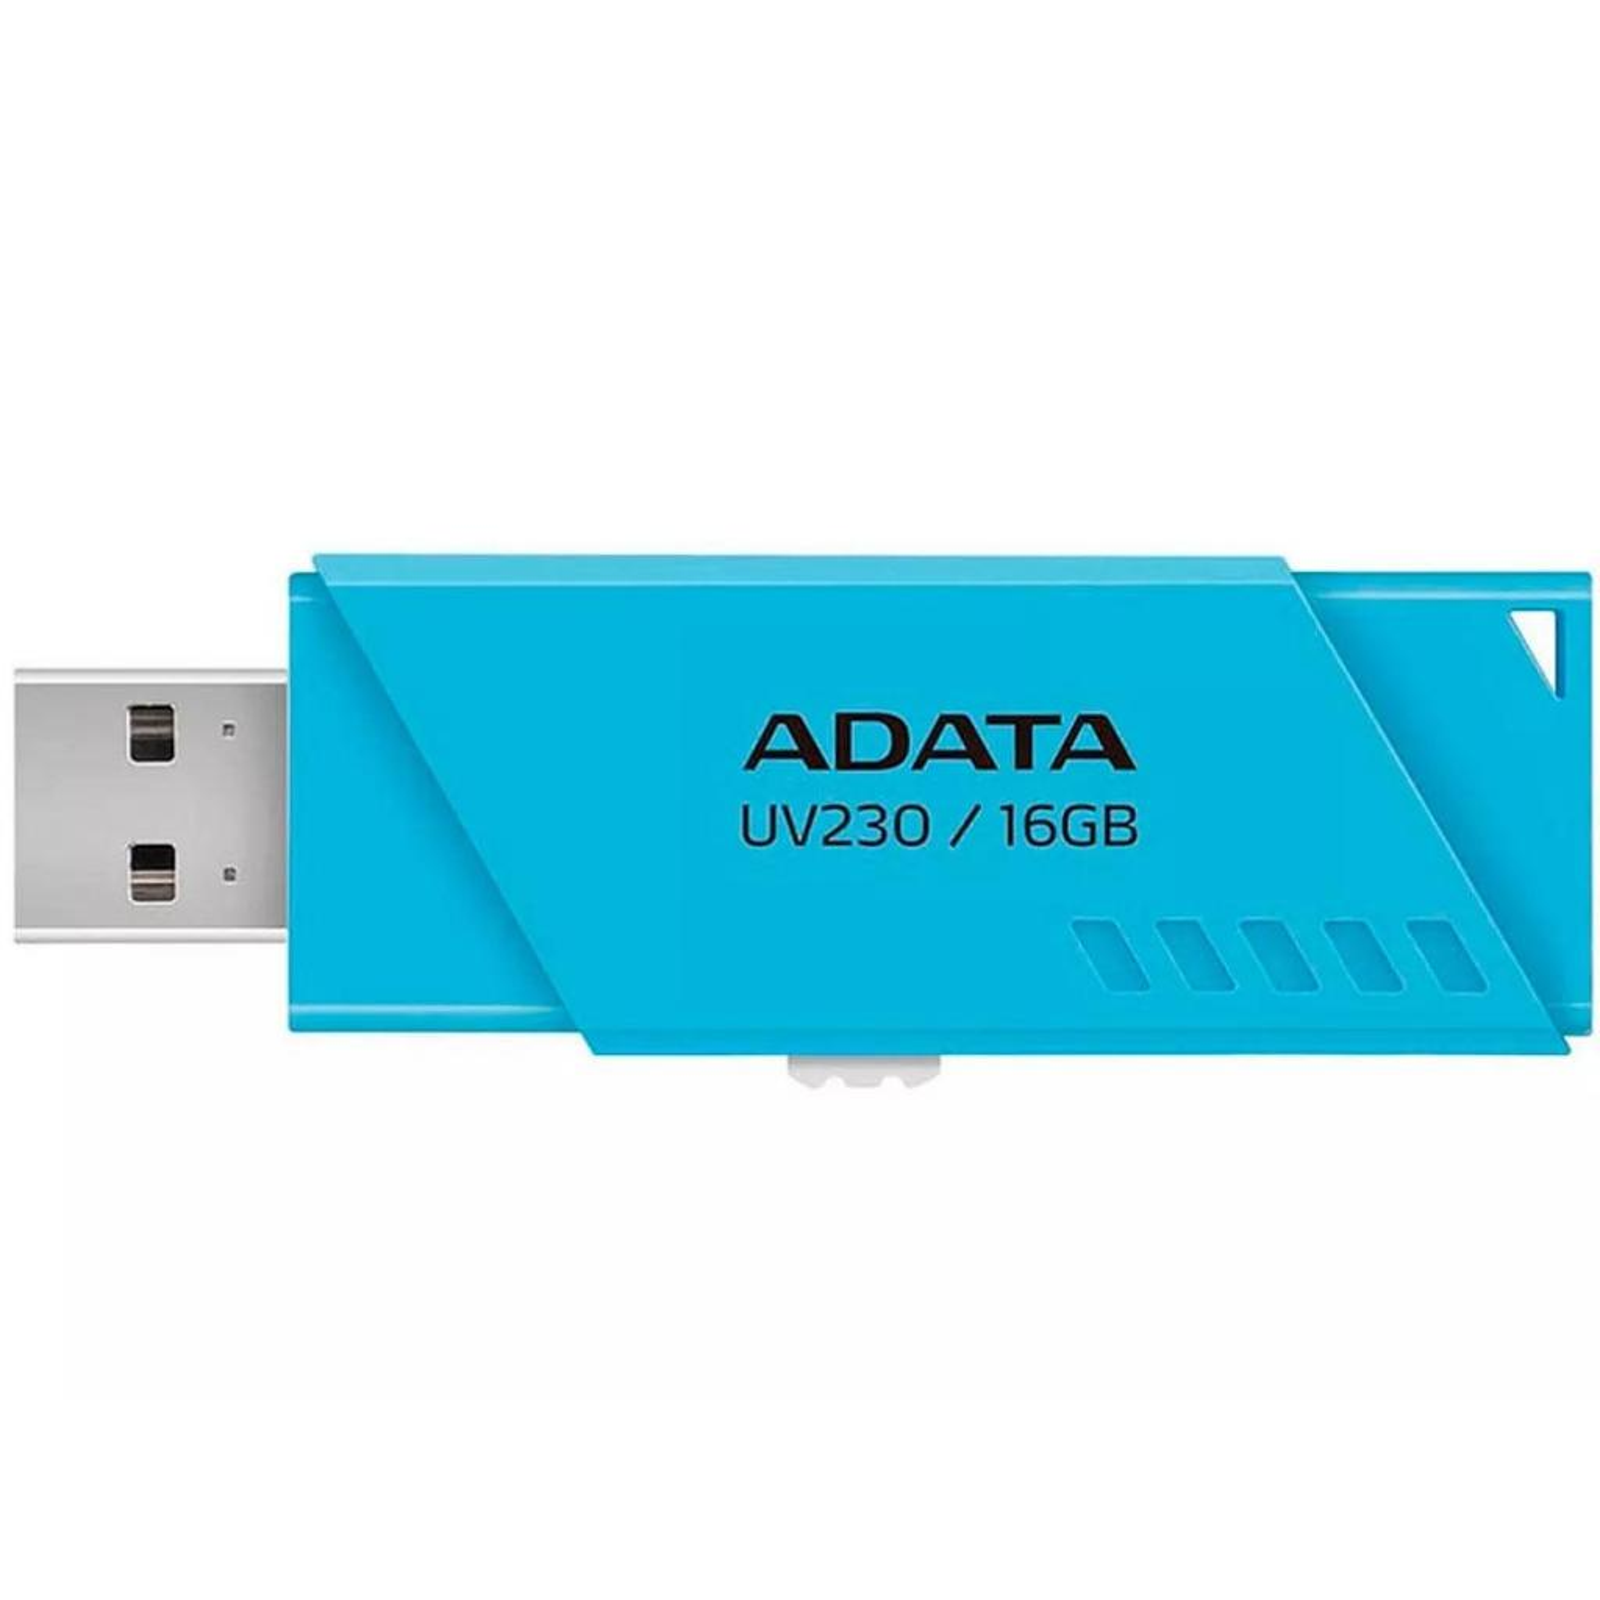 USB флеш накопитель ADATA 16GB UV230 Blue USB 2.0 (AUV230-16G-RBL)